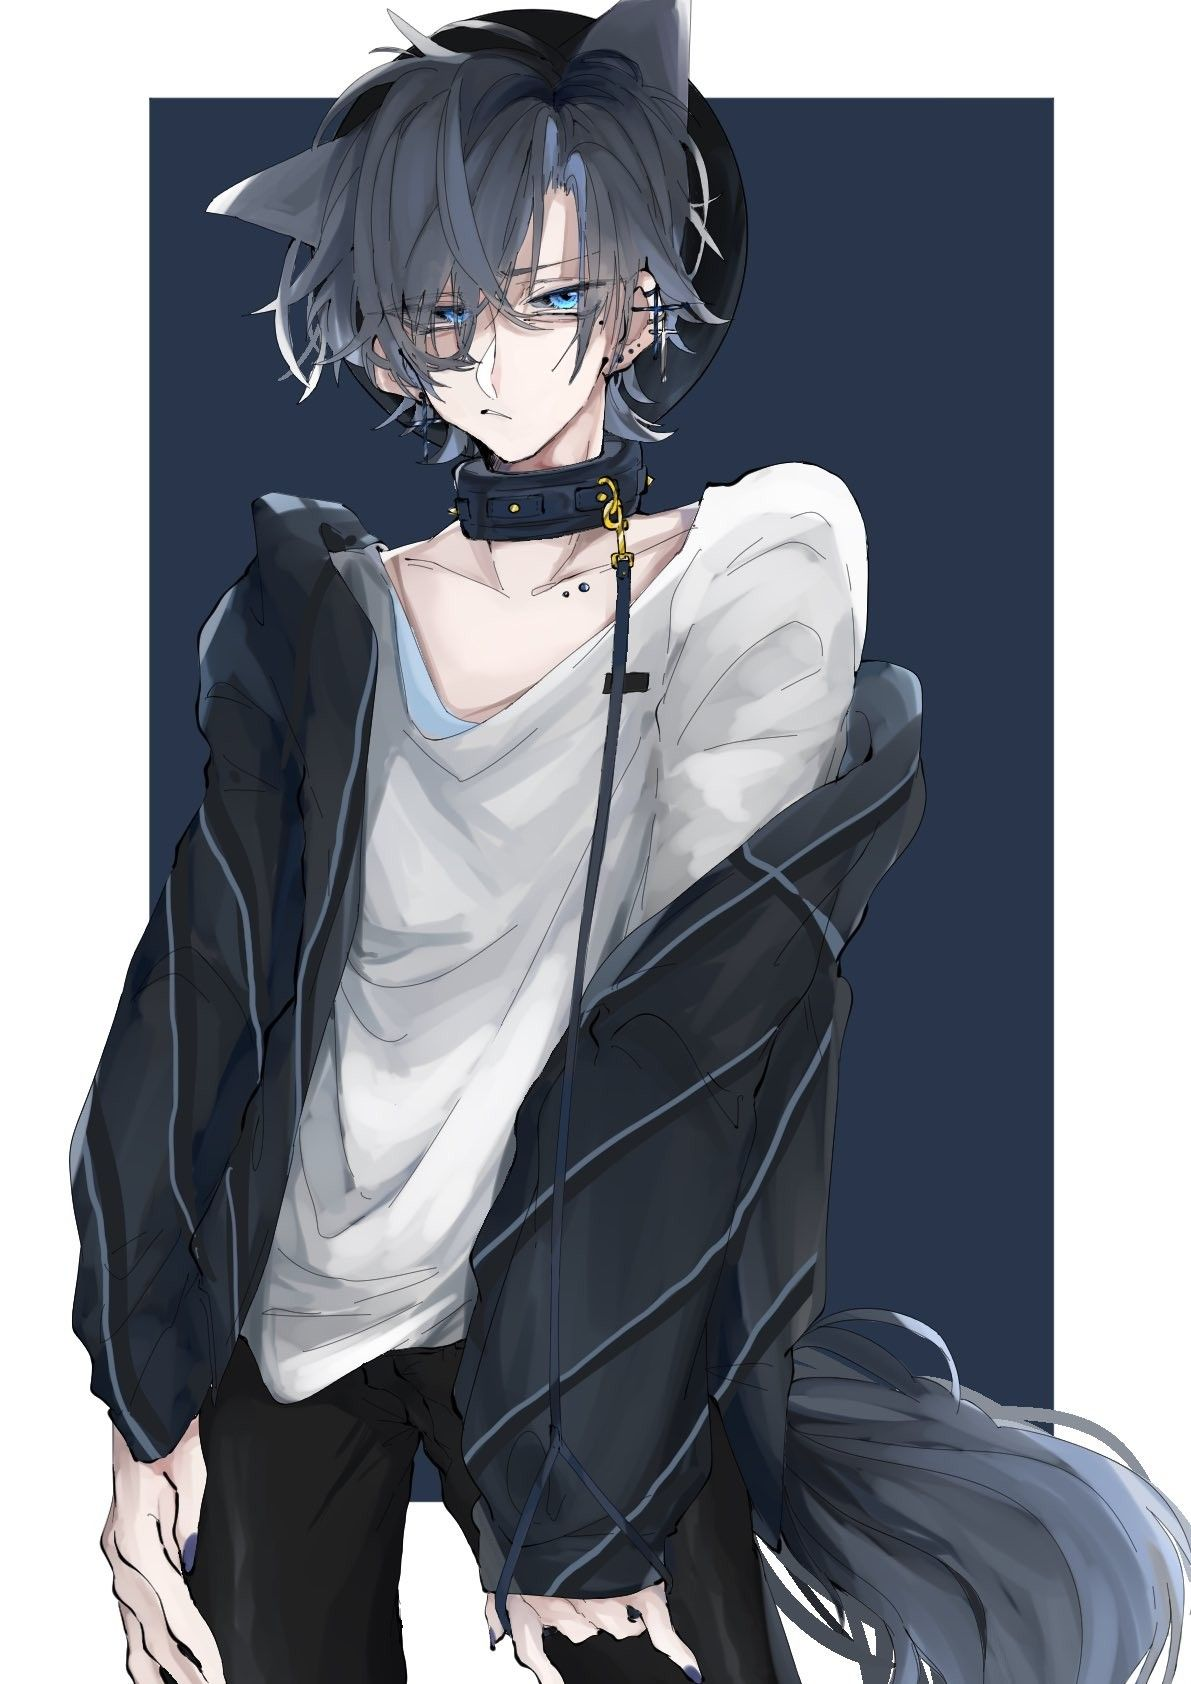 ᥲᥒιmᥱ. image by ¡𝗕𝟬𝗬𝗙𝗥𝗜𝗫𝗡𝗗 Anime cat boy, Anime drawings